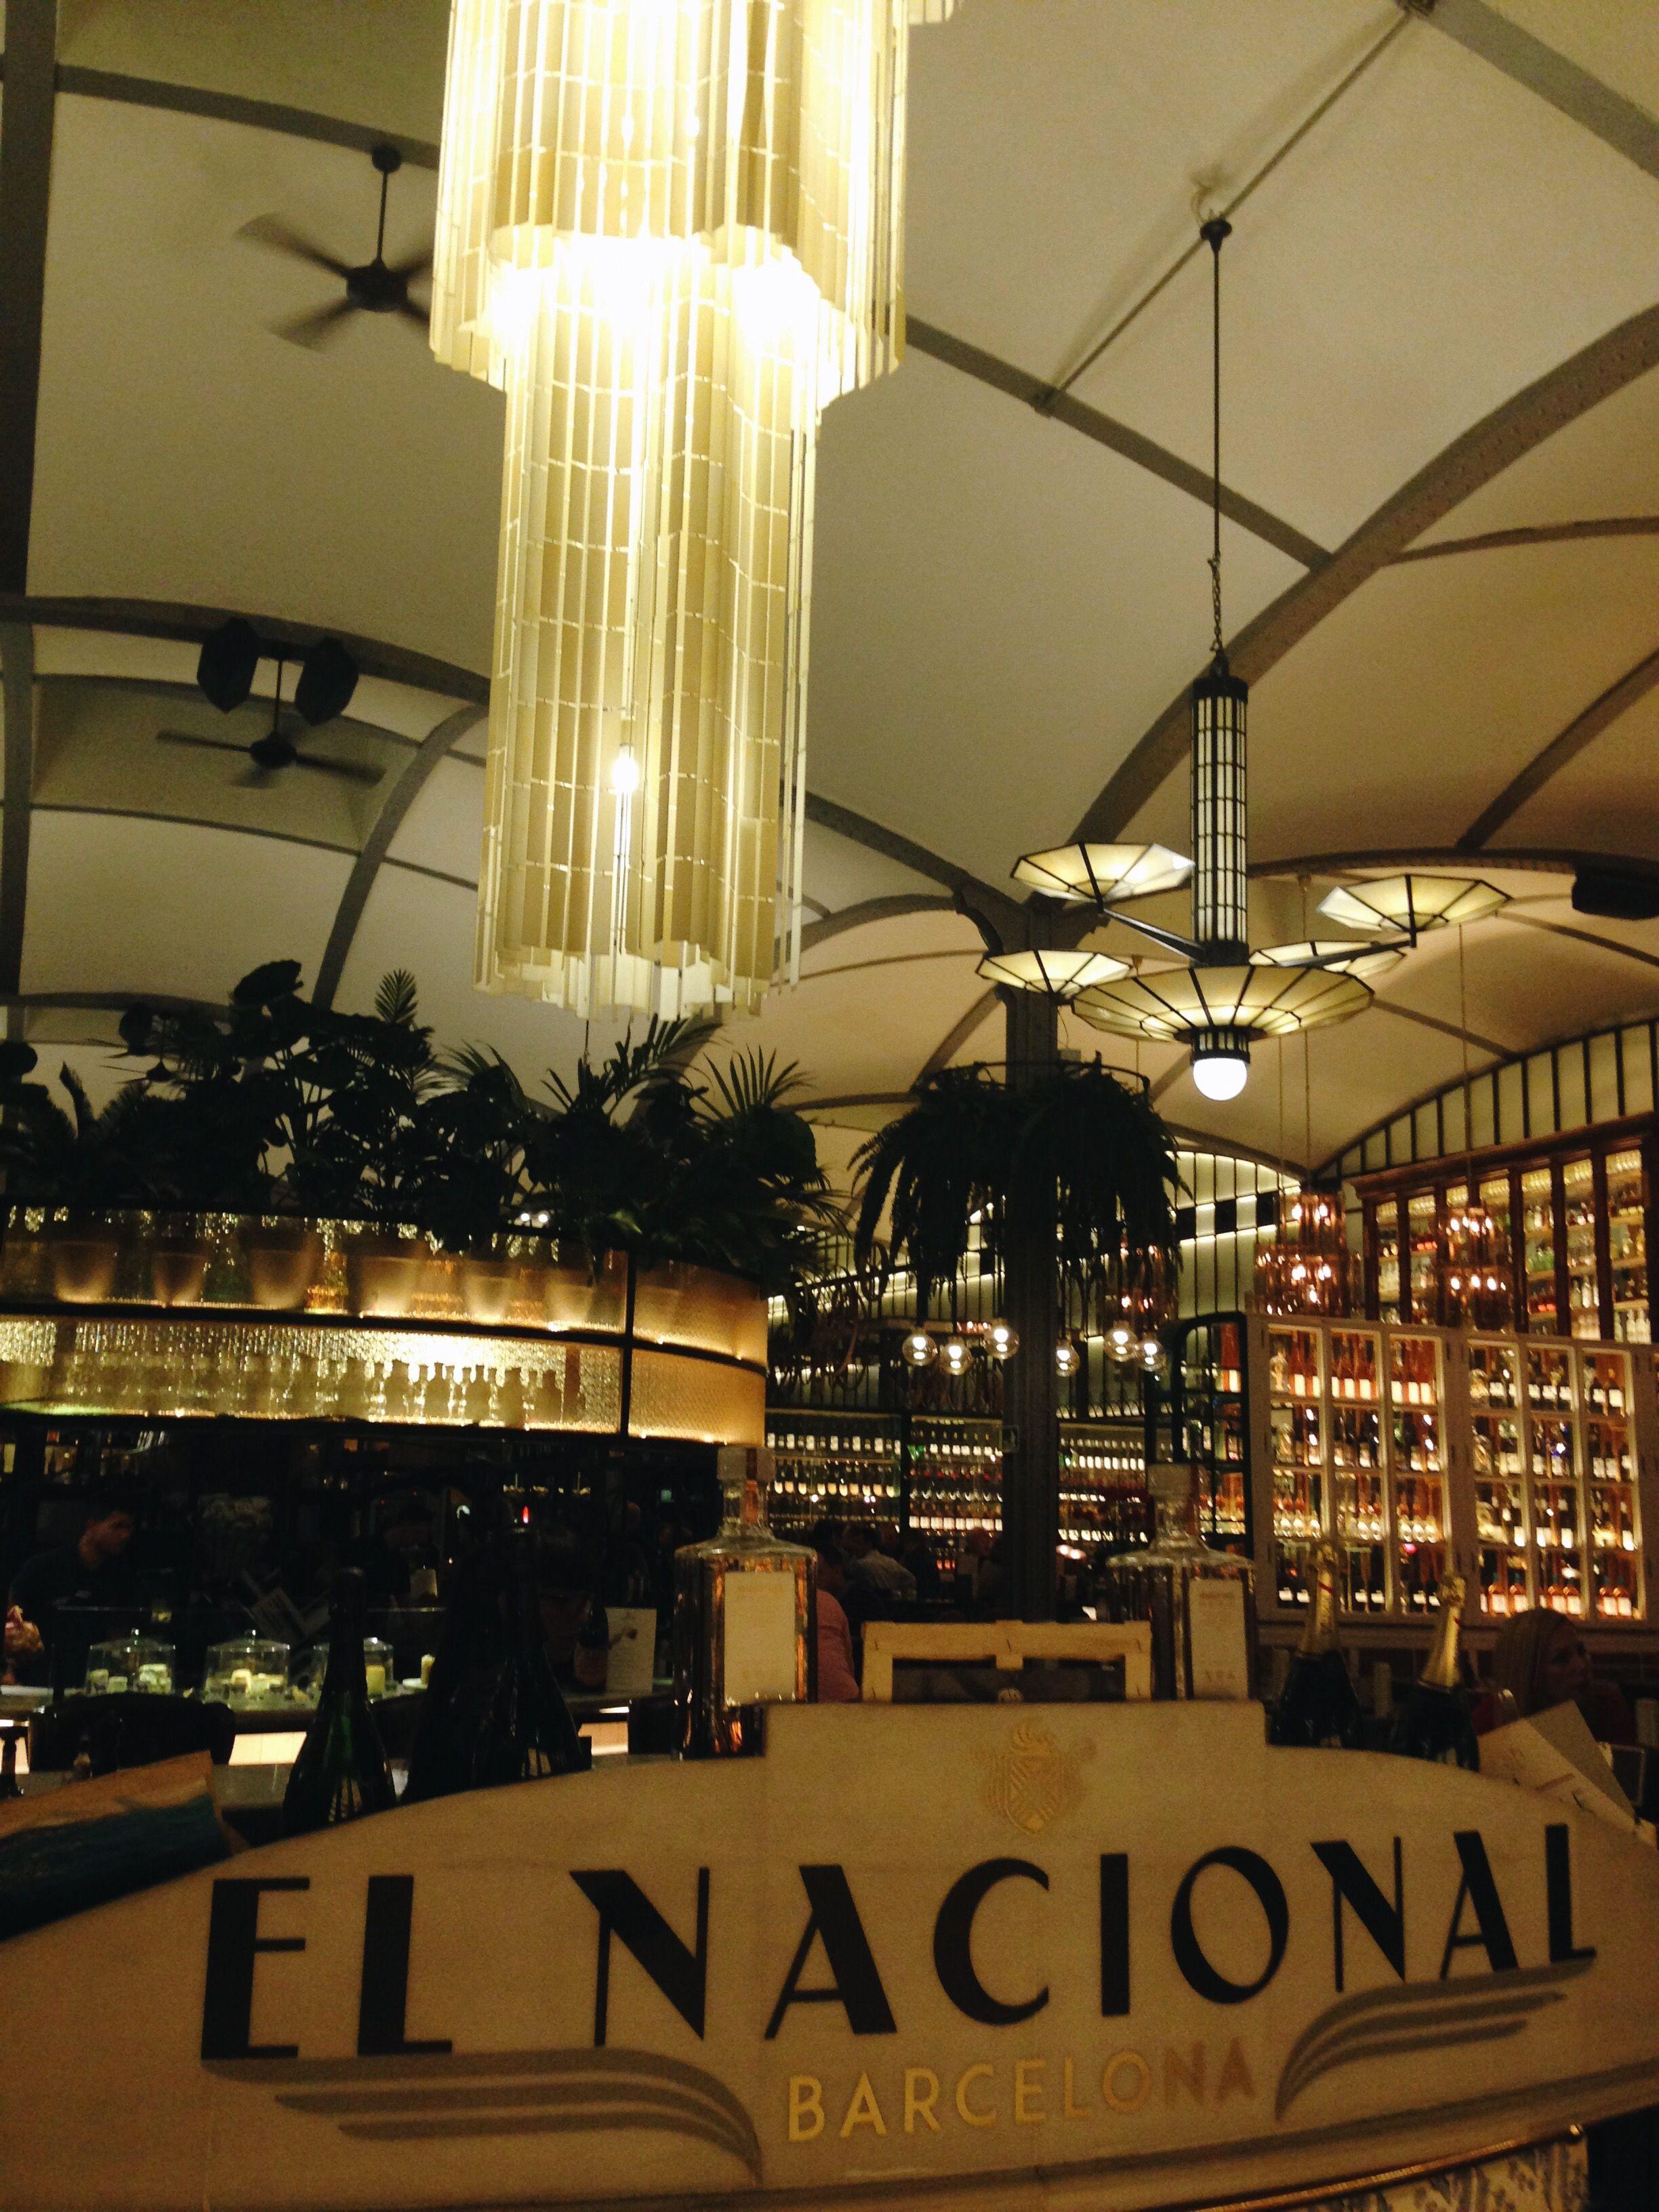 el nacional barcelona recomendaciones